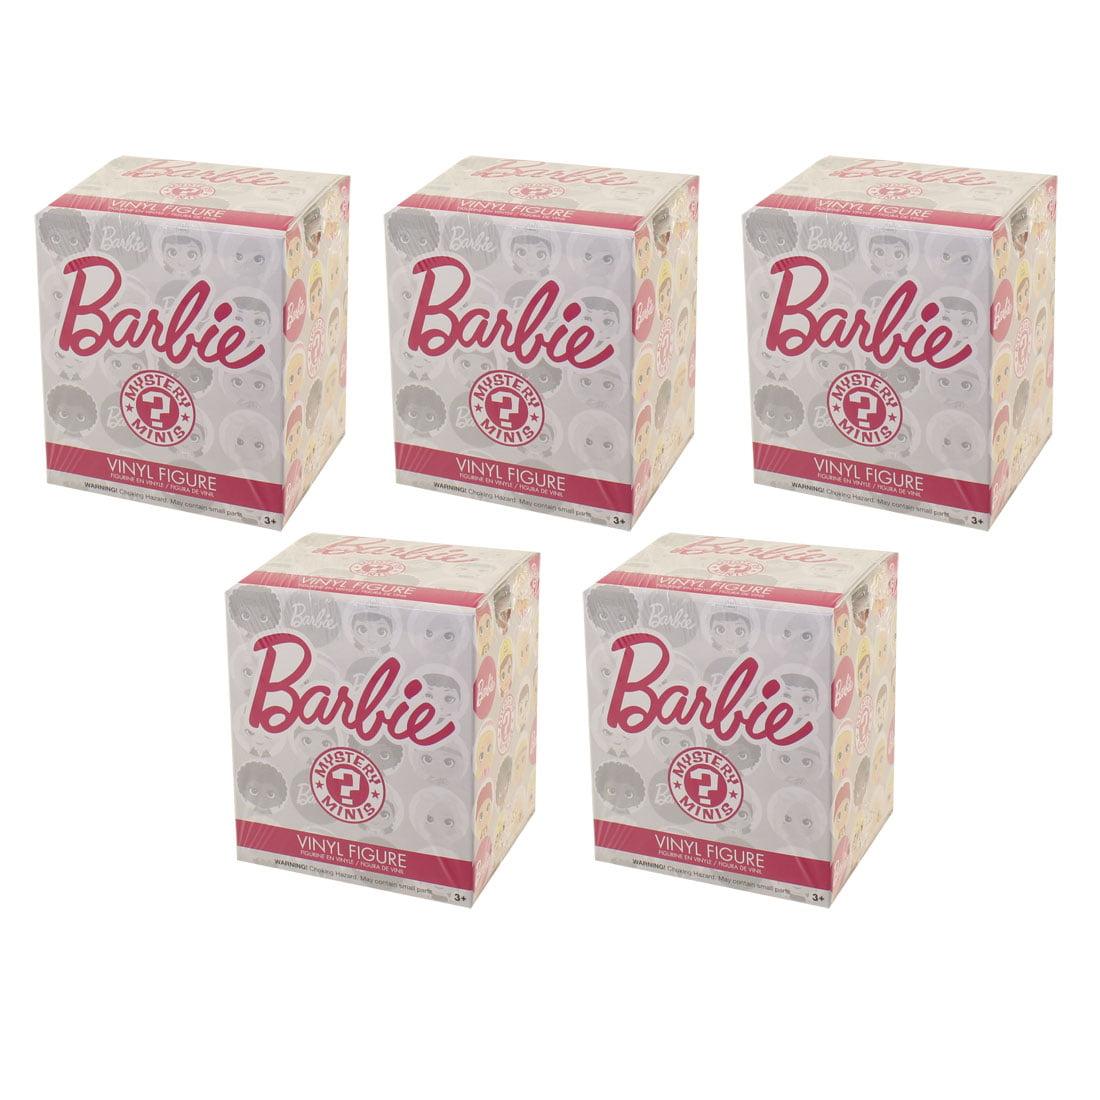 Funko Mystery Minis Vinyl Figure - Barbie - Blind Packs (5 Pack Lot)